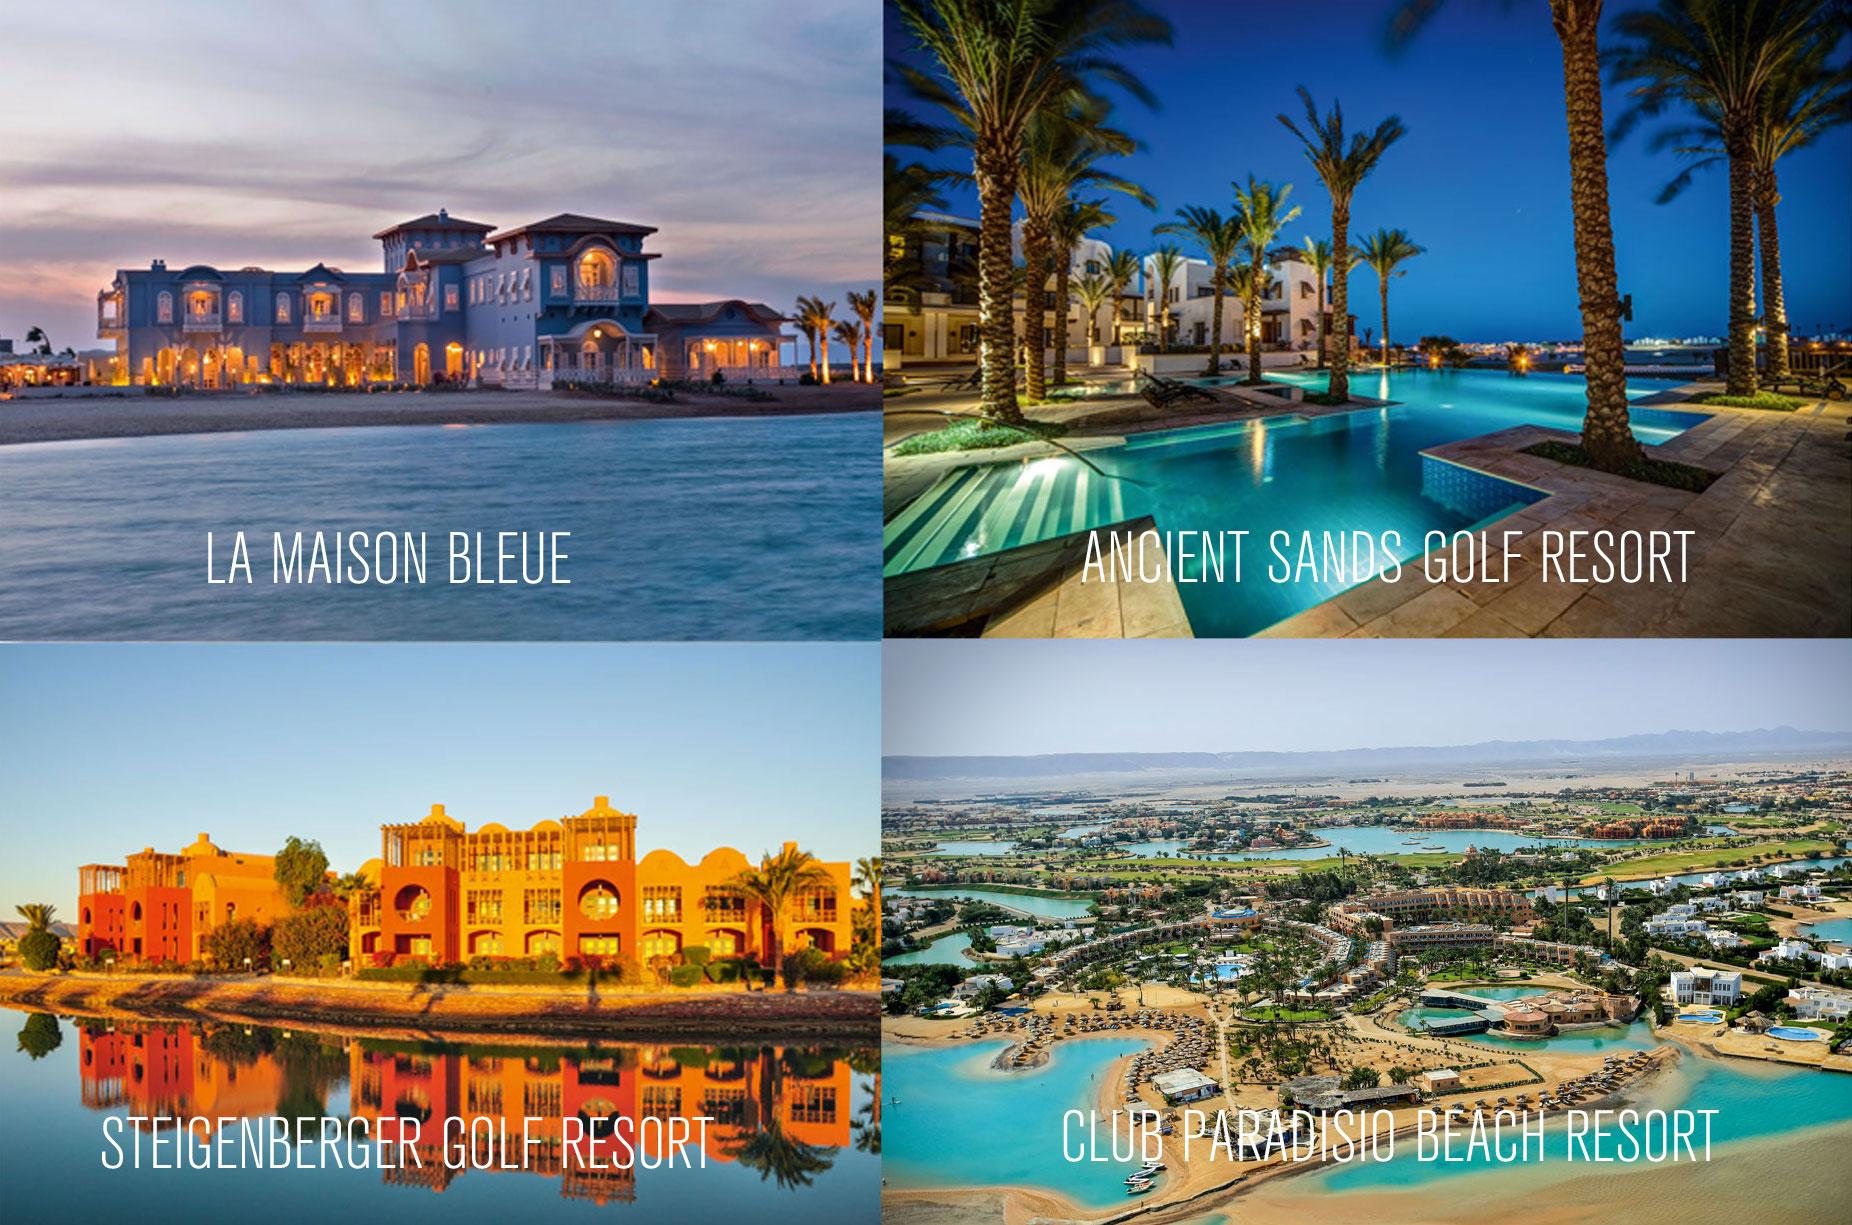 Fotos der Hotels in el gouna